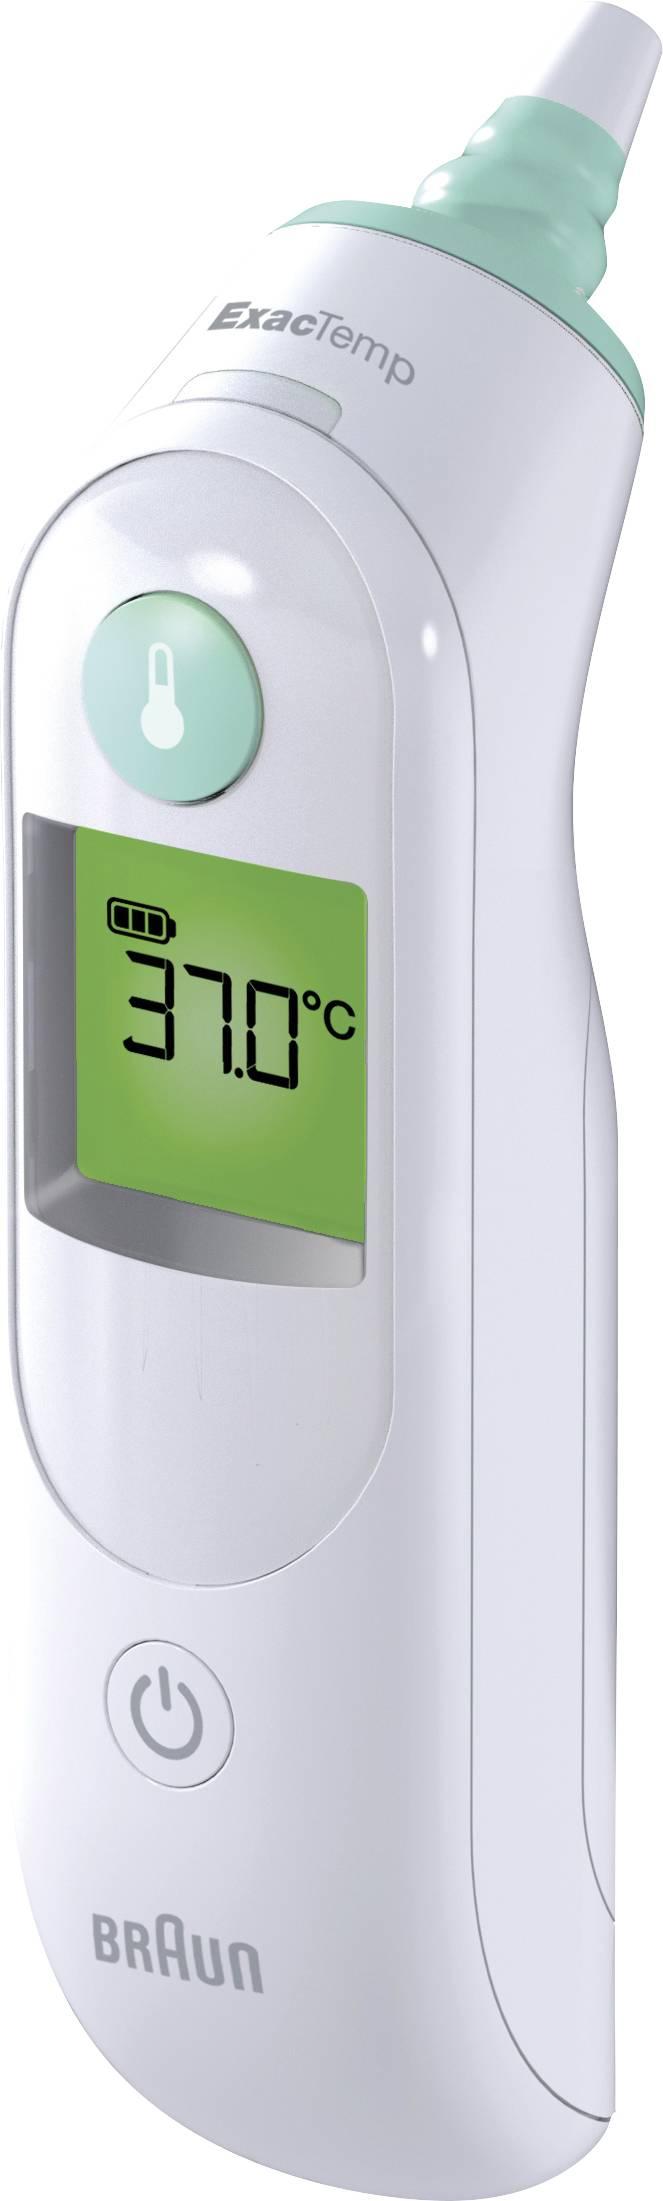 Febertermometer Braun ThermoScan® 6 Vit